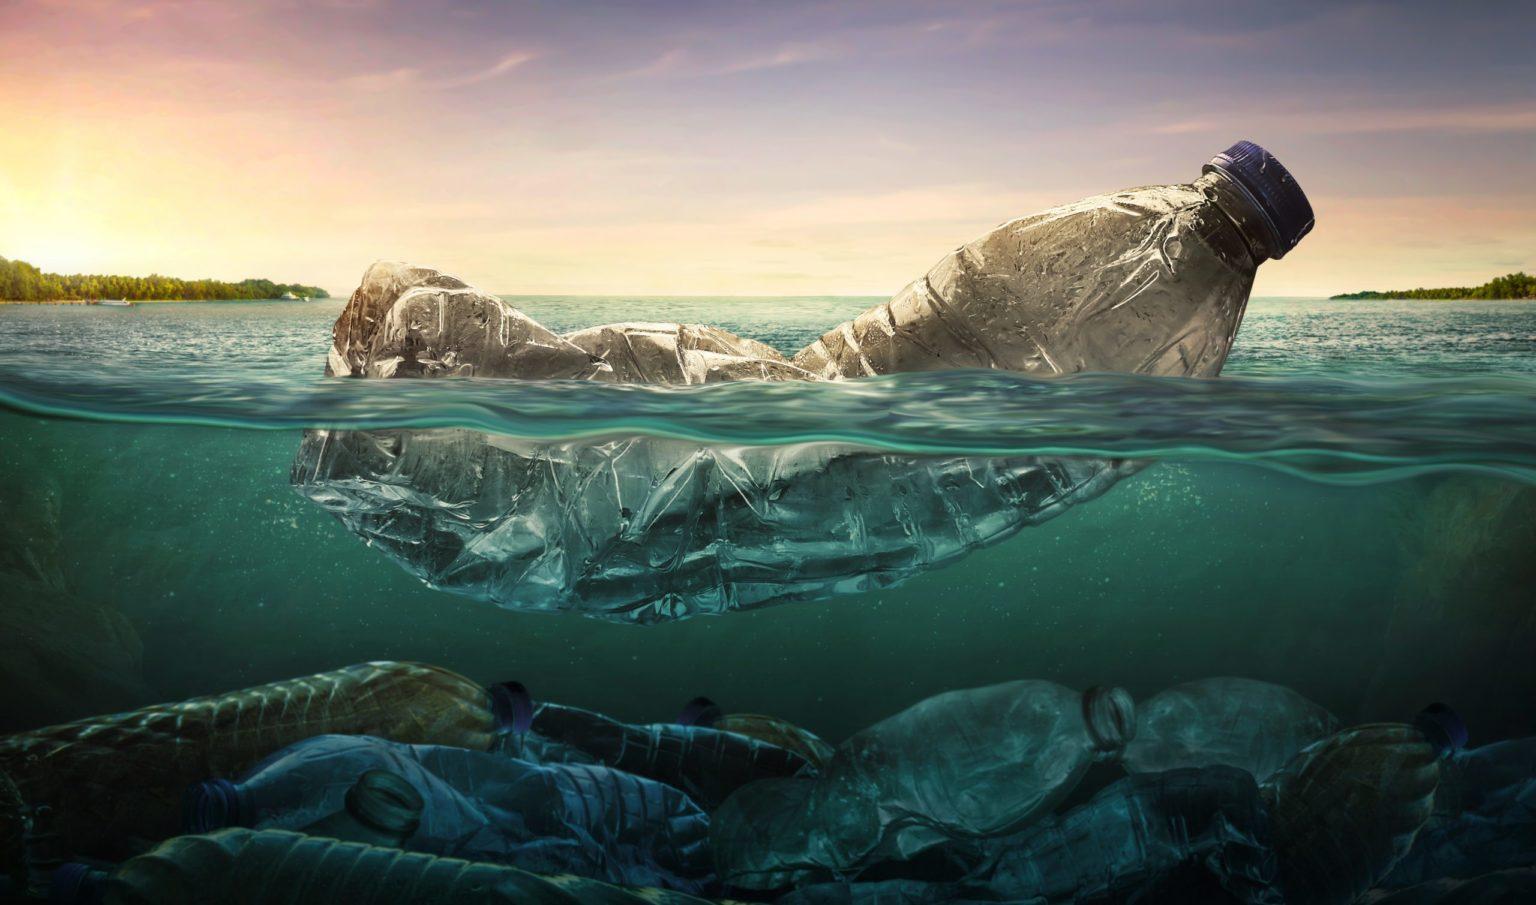 Plastic water bottles pollution in ocean